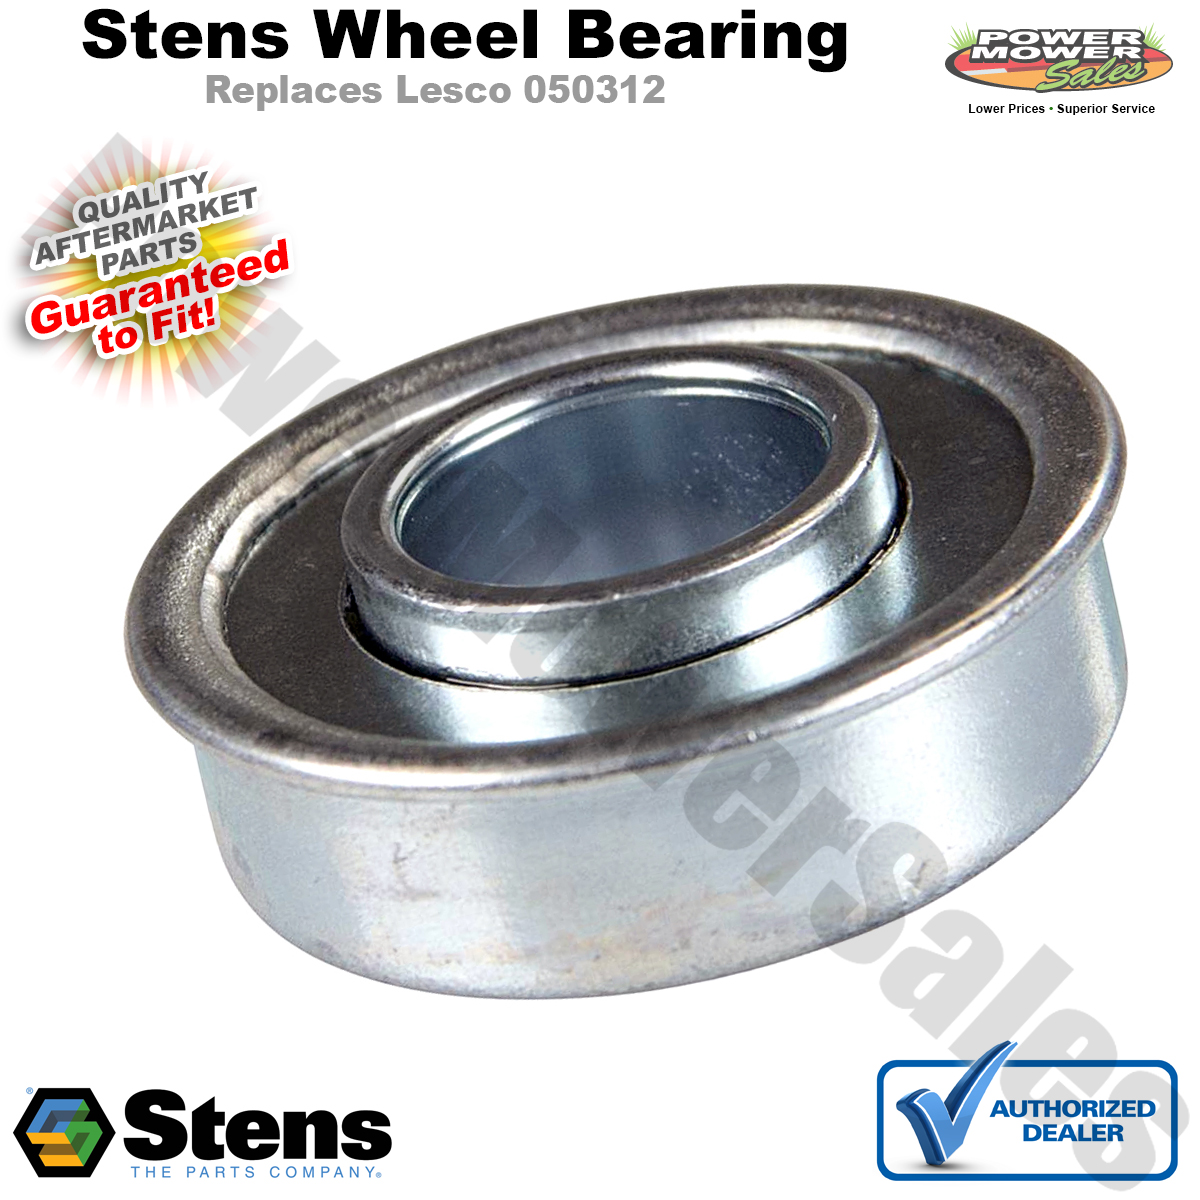 Stens 215-038 Wheel Bearing